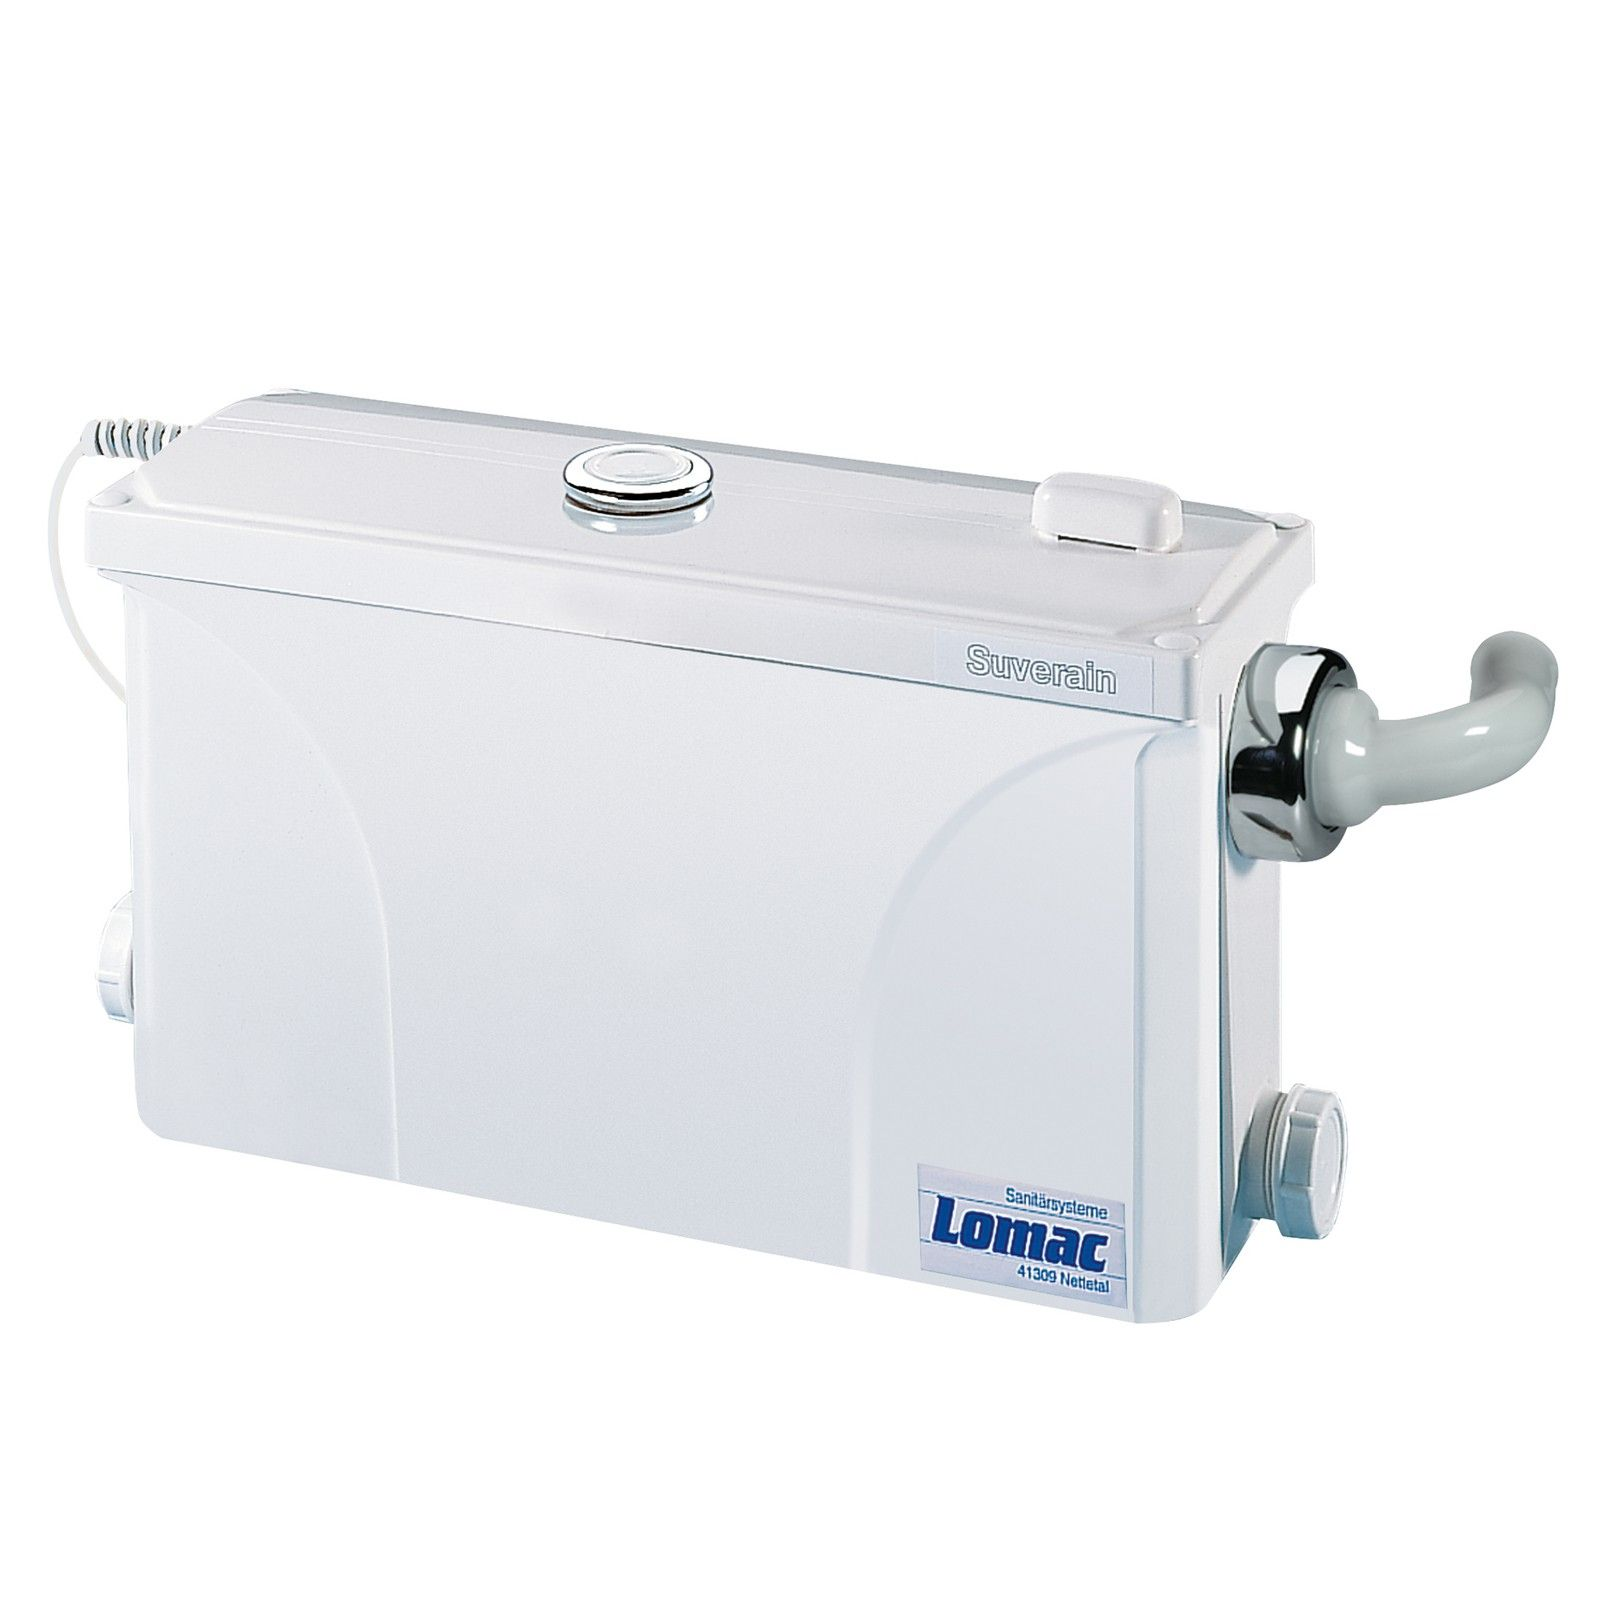 Sfa Lomac Suverain 30ffa A Hebeanlagen Kuche Waschmaschine Dusche Abwasserpumpen Schmutzwasserpumpen Sanitar Abwasser Schmutzwasserpumpe